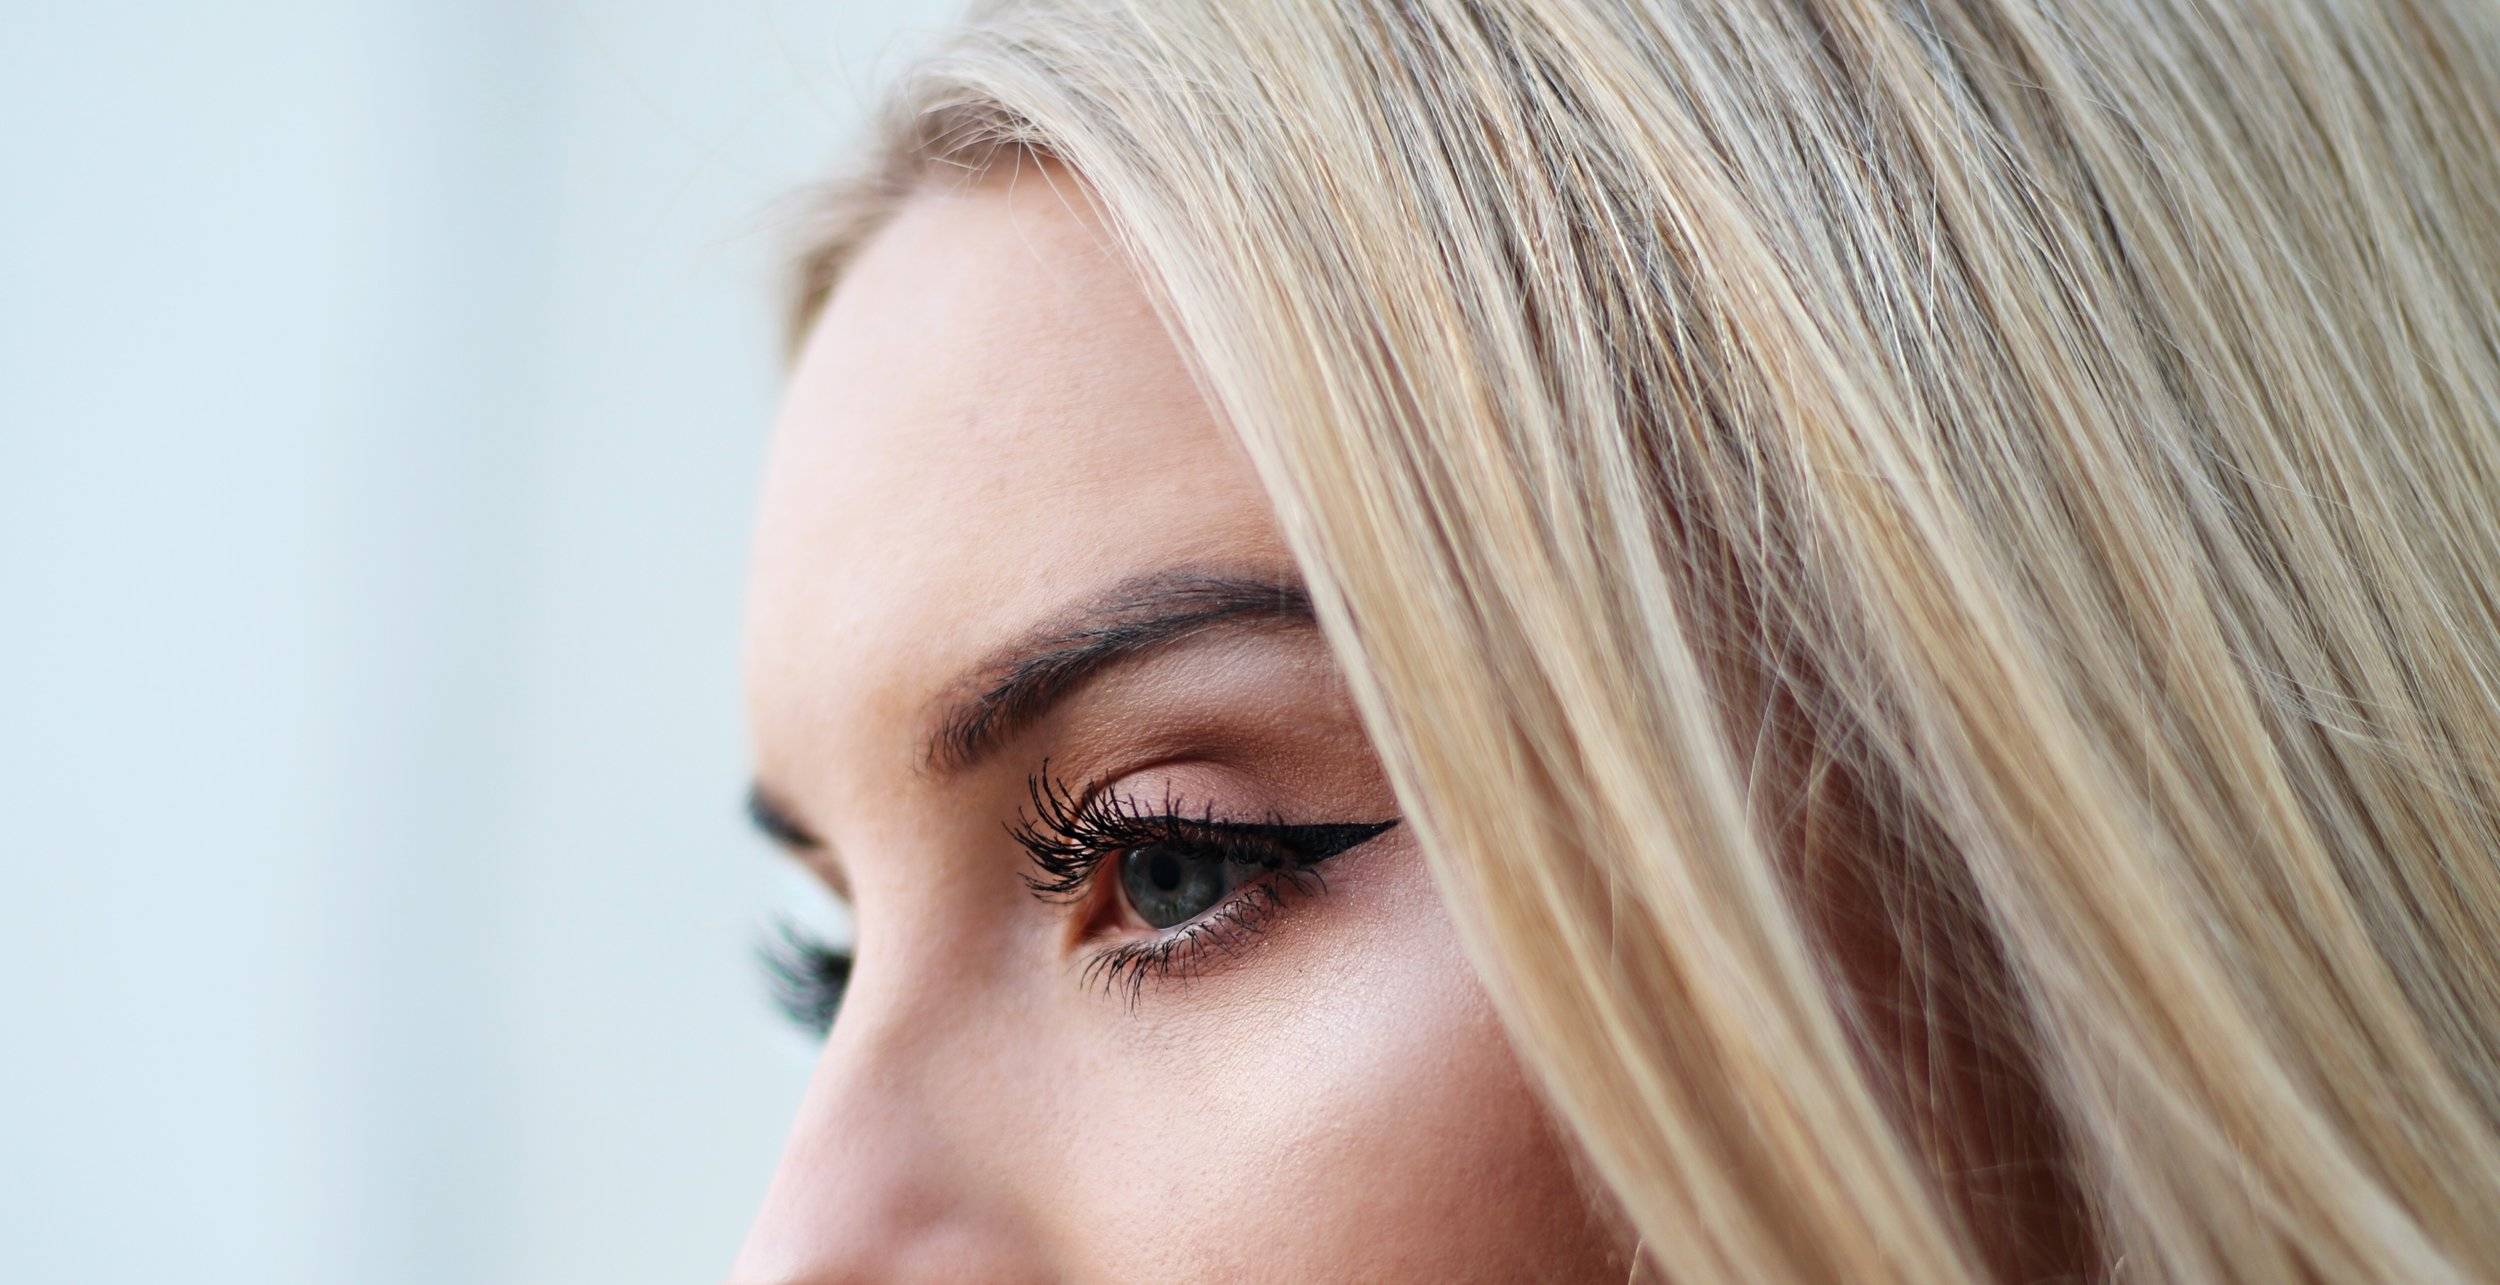 How To Grow Eyelashes | Izzy Wears Blog